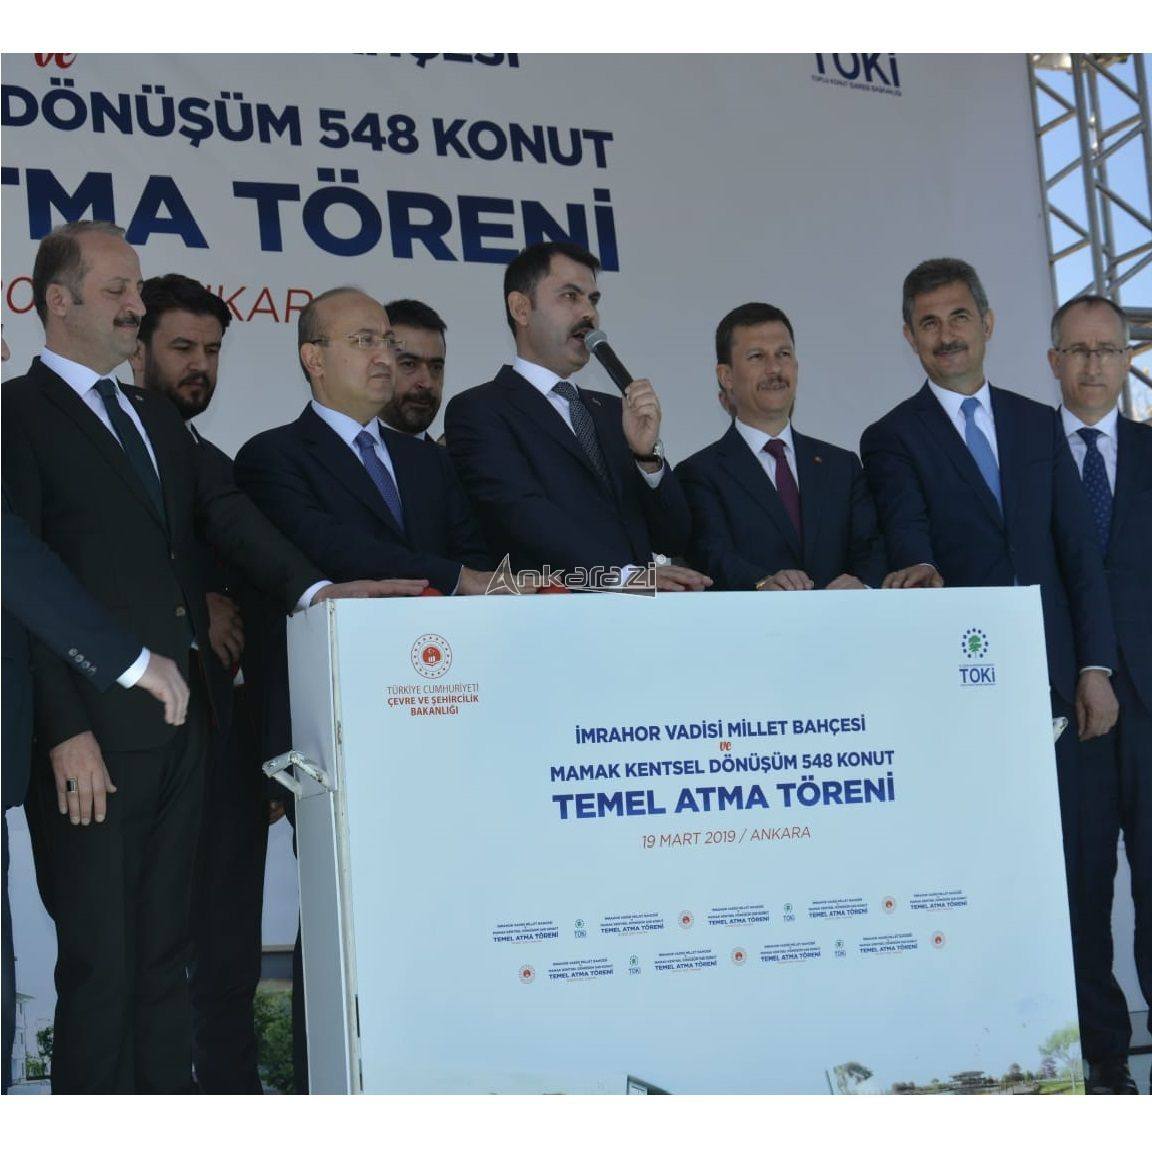 Kanal Ankara ve Mamak 548 Konut Temel Atma Töreni... 3666